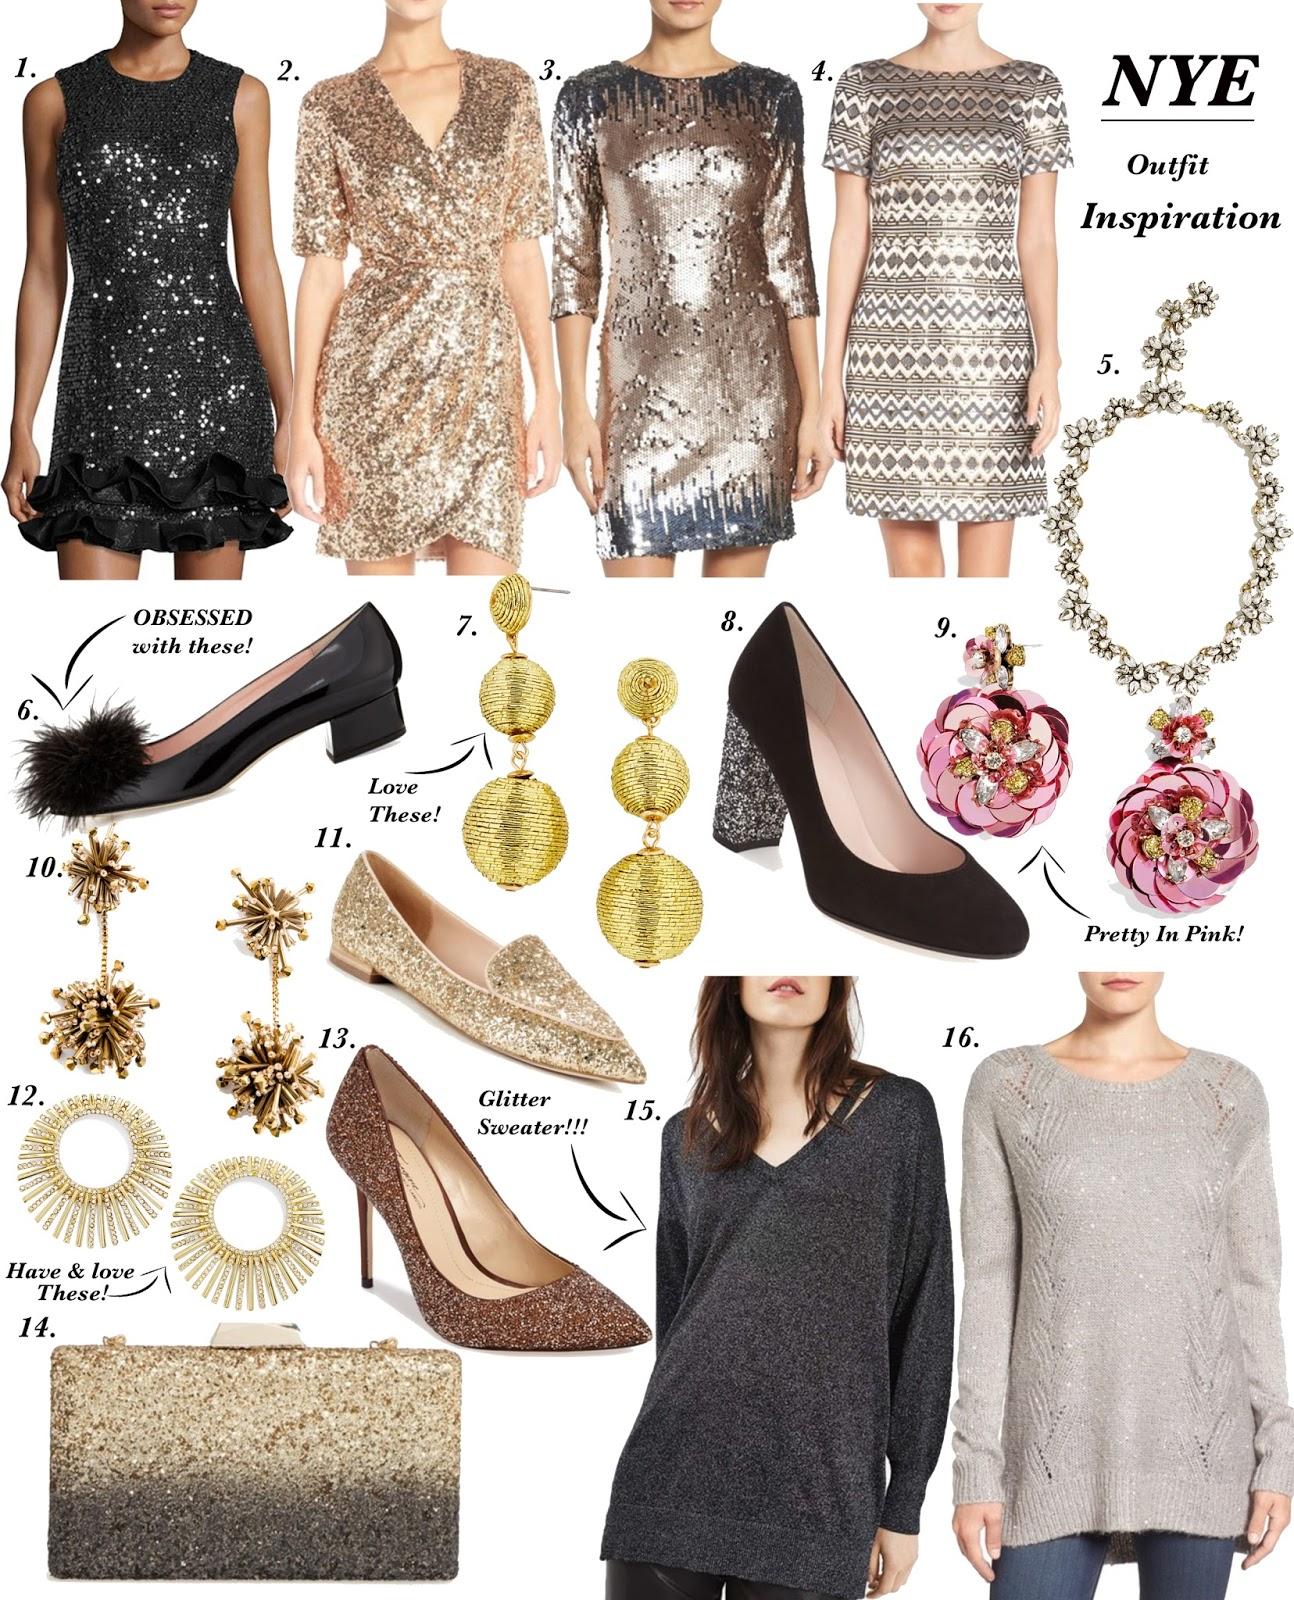 NYE Outfit Inspiration - Something Delightful Blog